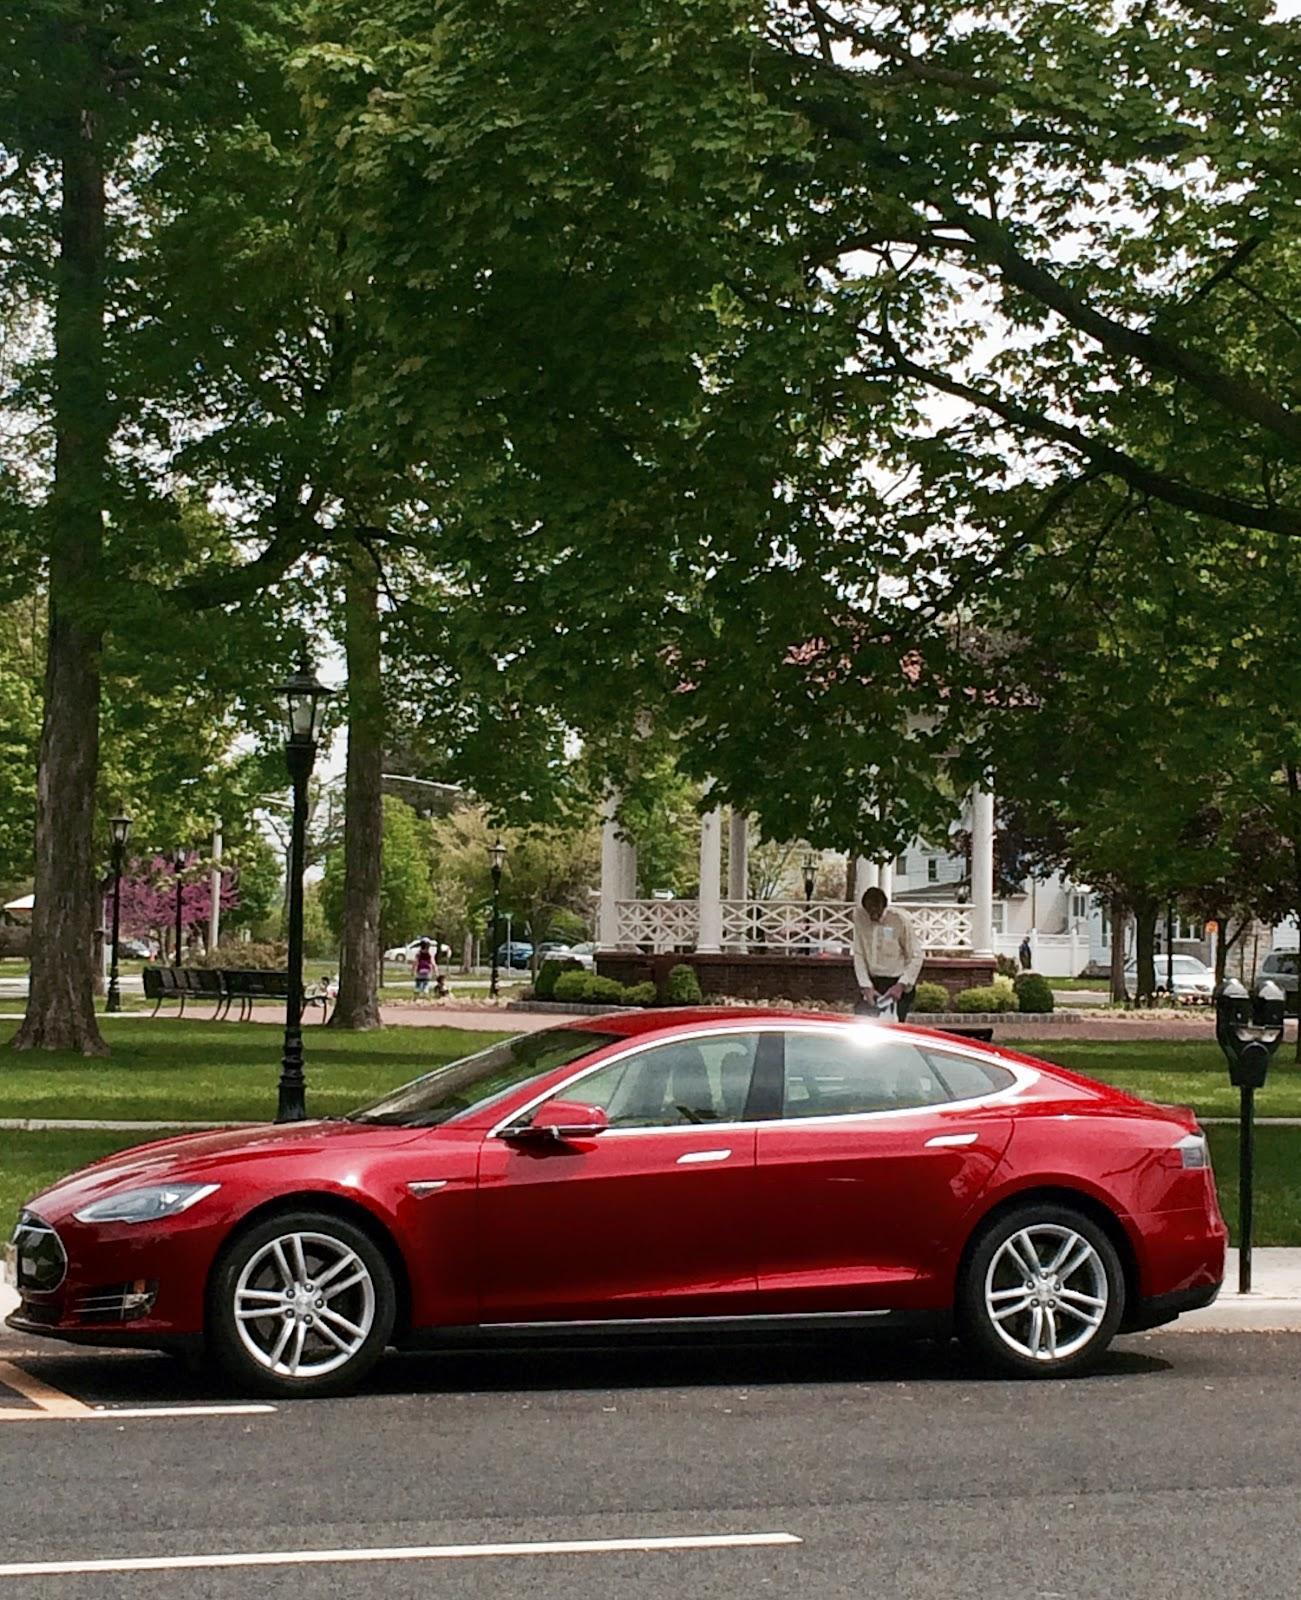 Shocking Car News: Tesla Model S Sparkles In Suburban